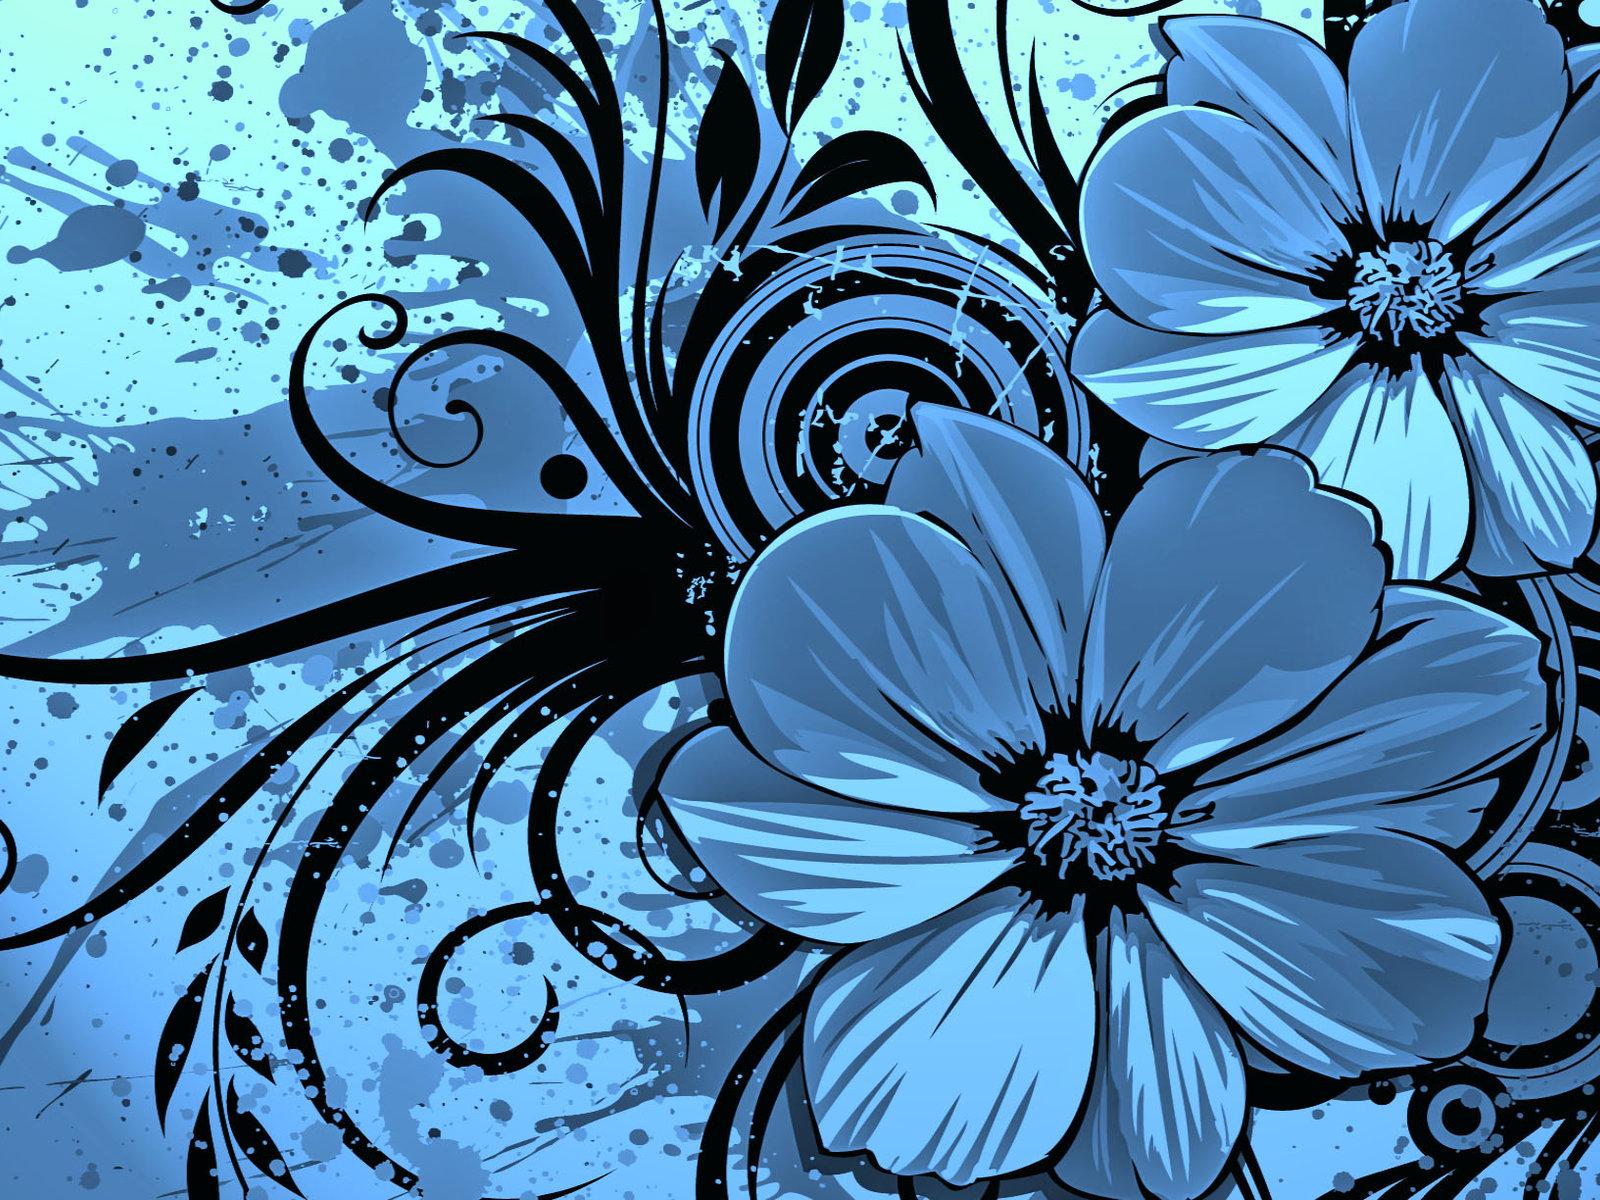 Dark Blue And White Flowers: 【壁紙】 美麗な おしゃれ壁紙 【1600x1200】 : 【壁紙】 オシャレな壁紙 【美しい壁紙】